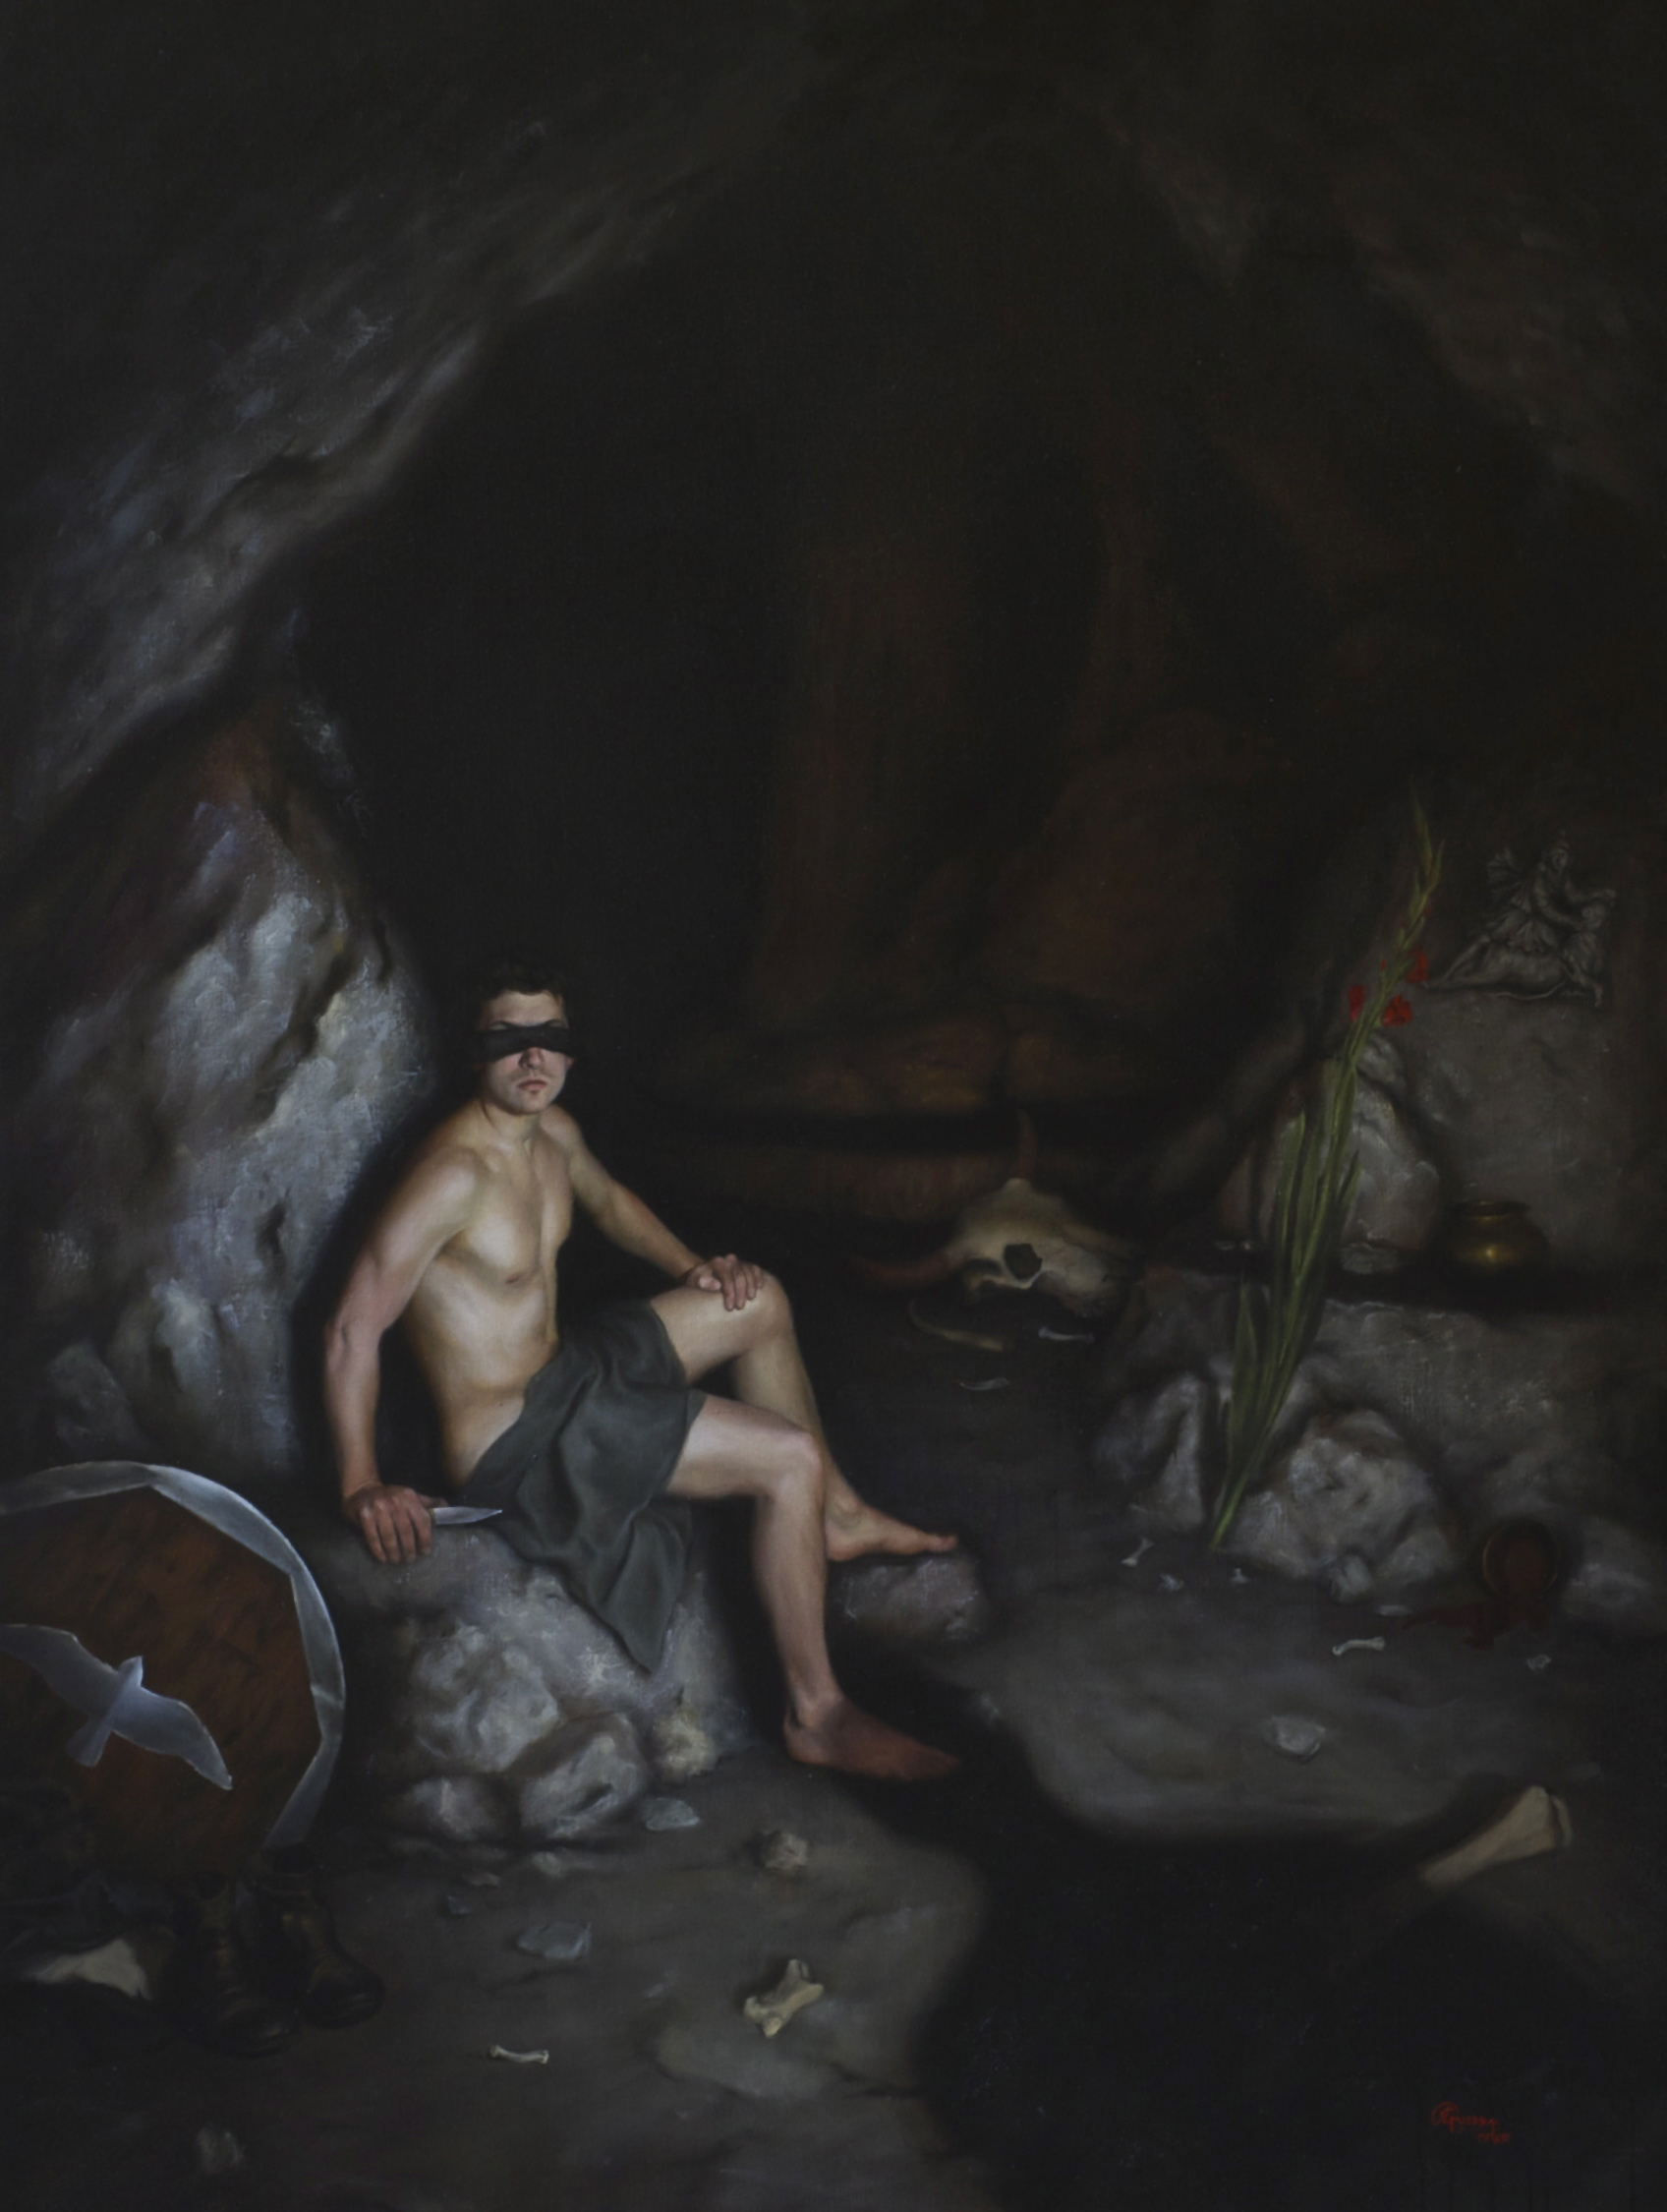 Si Vis Pacem Para Bellum 1, Rafael Guerra Painting Pintura